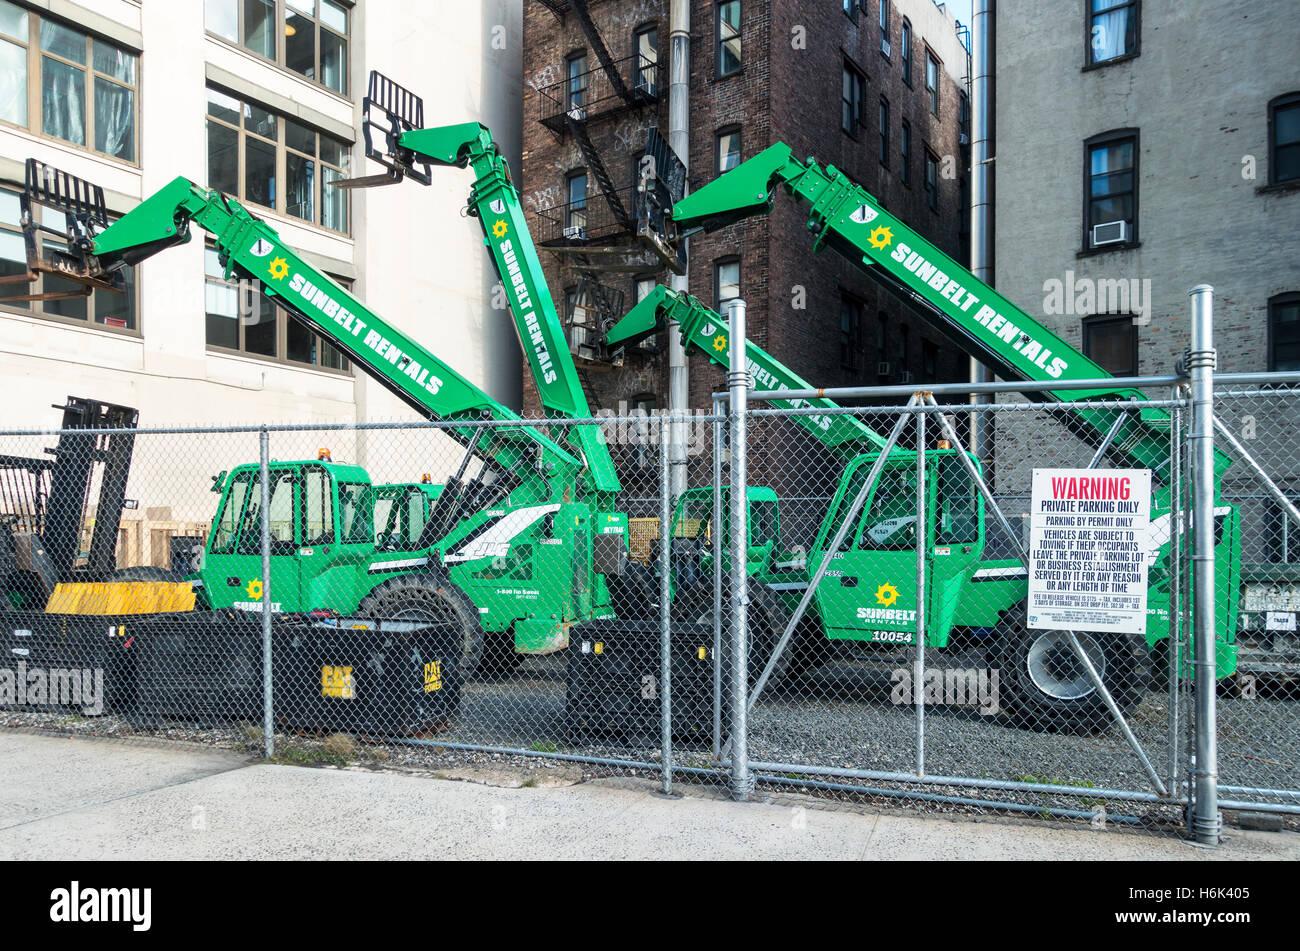 Three trucks with lifts, telescopic cranes in New York City - Stock Image